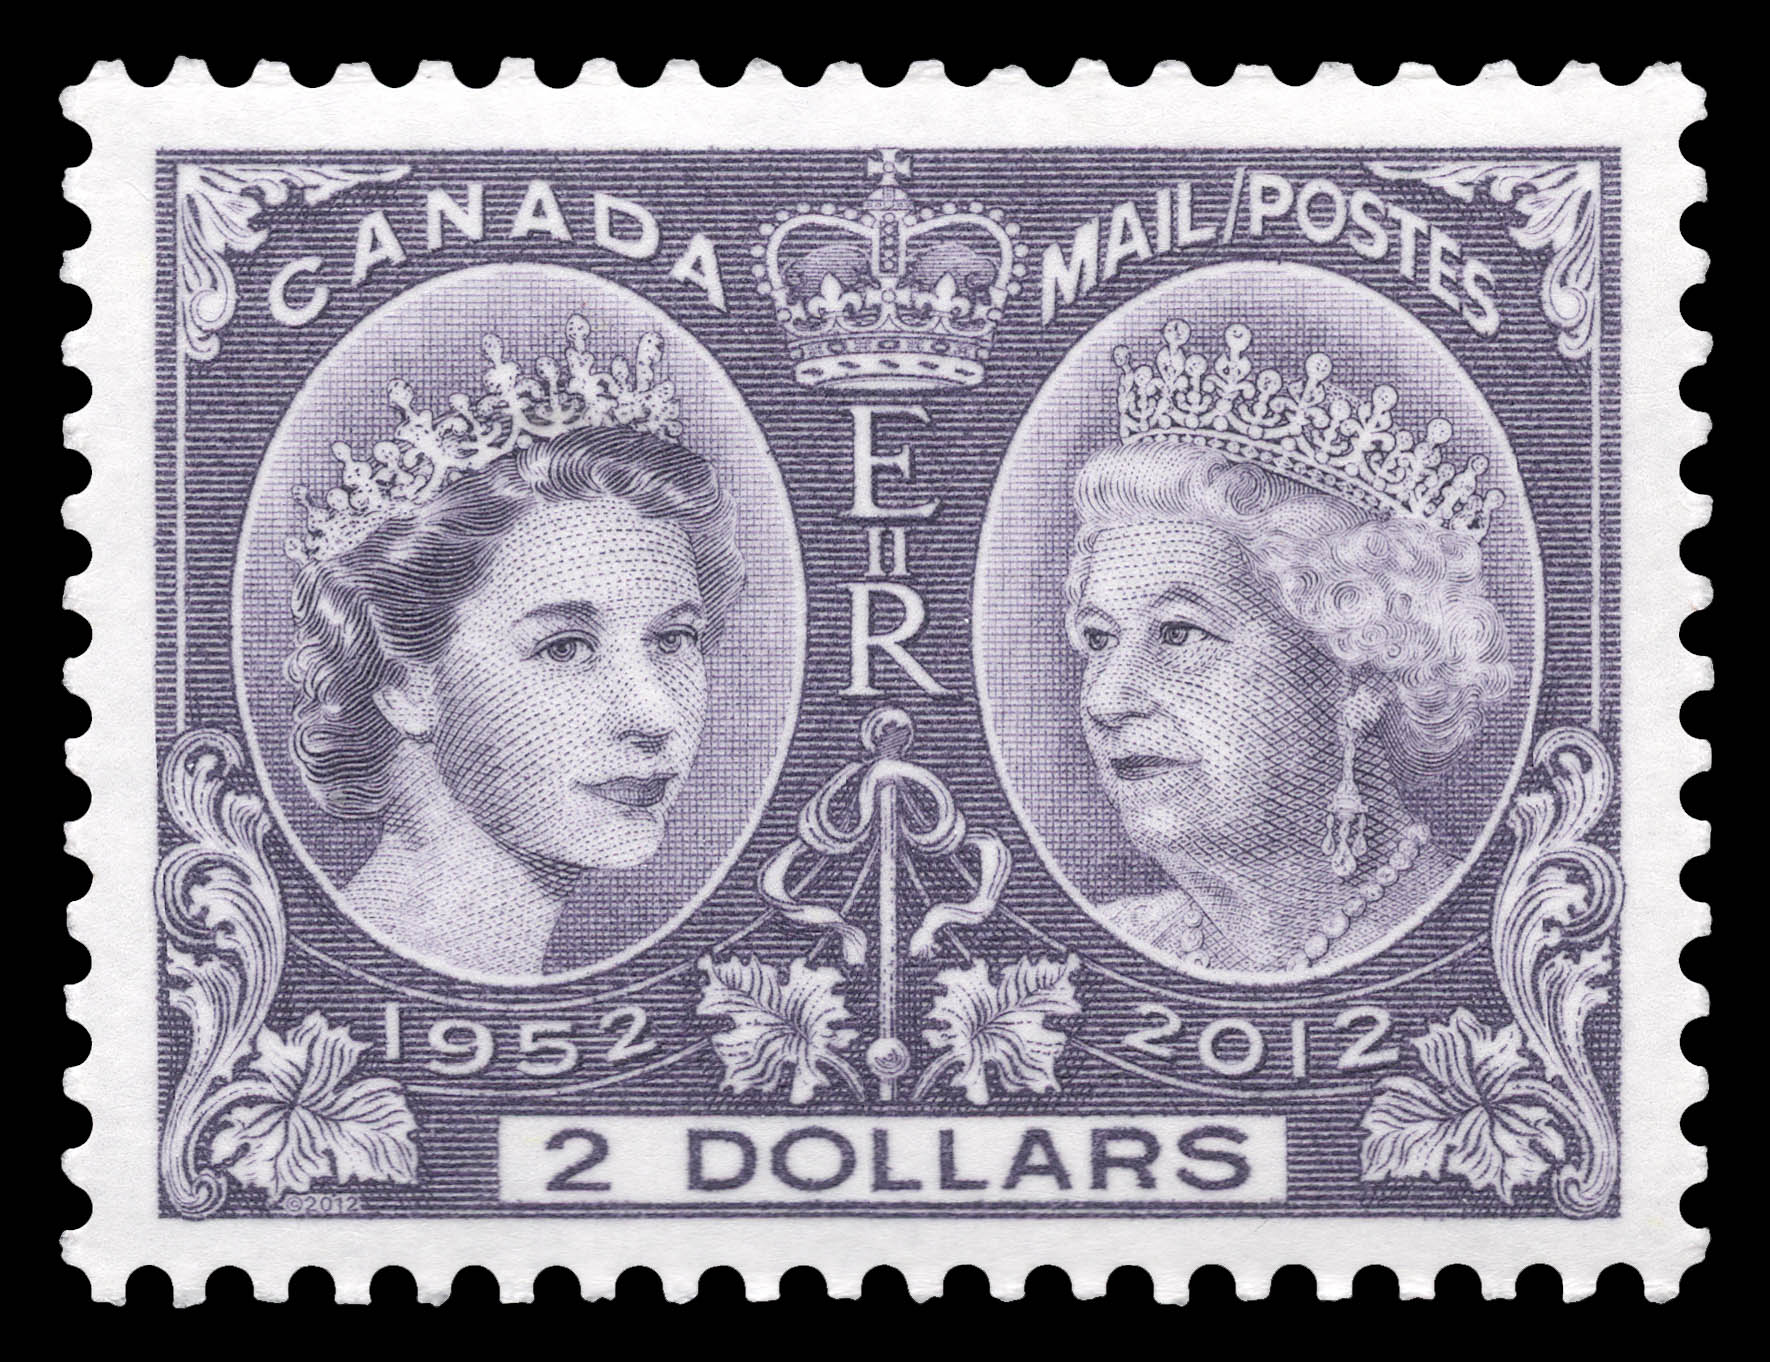 Queen Elizabeth II Diamond Jubilee Canada Postage Stamp | Queen Elizabeth II Diamond Jubilee